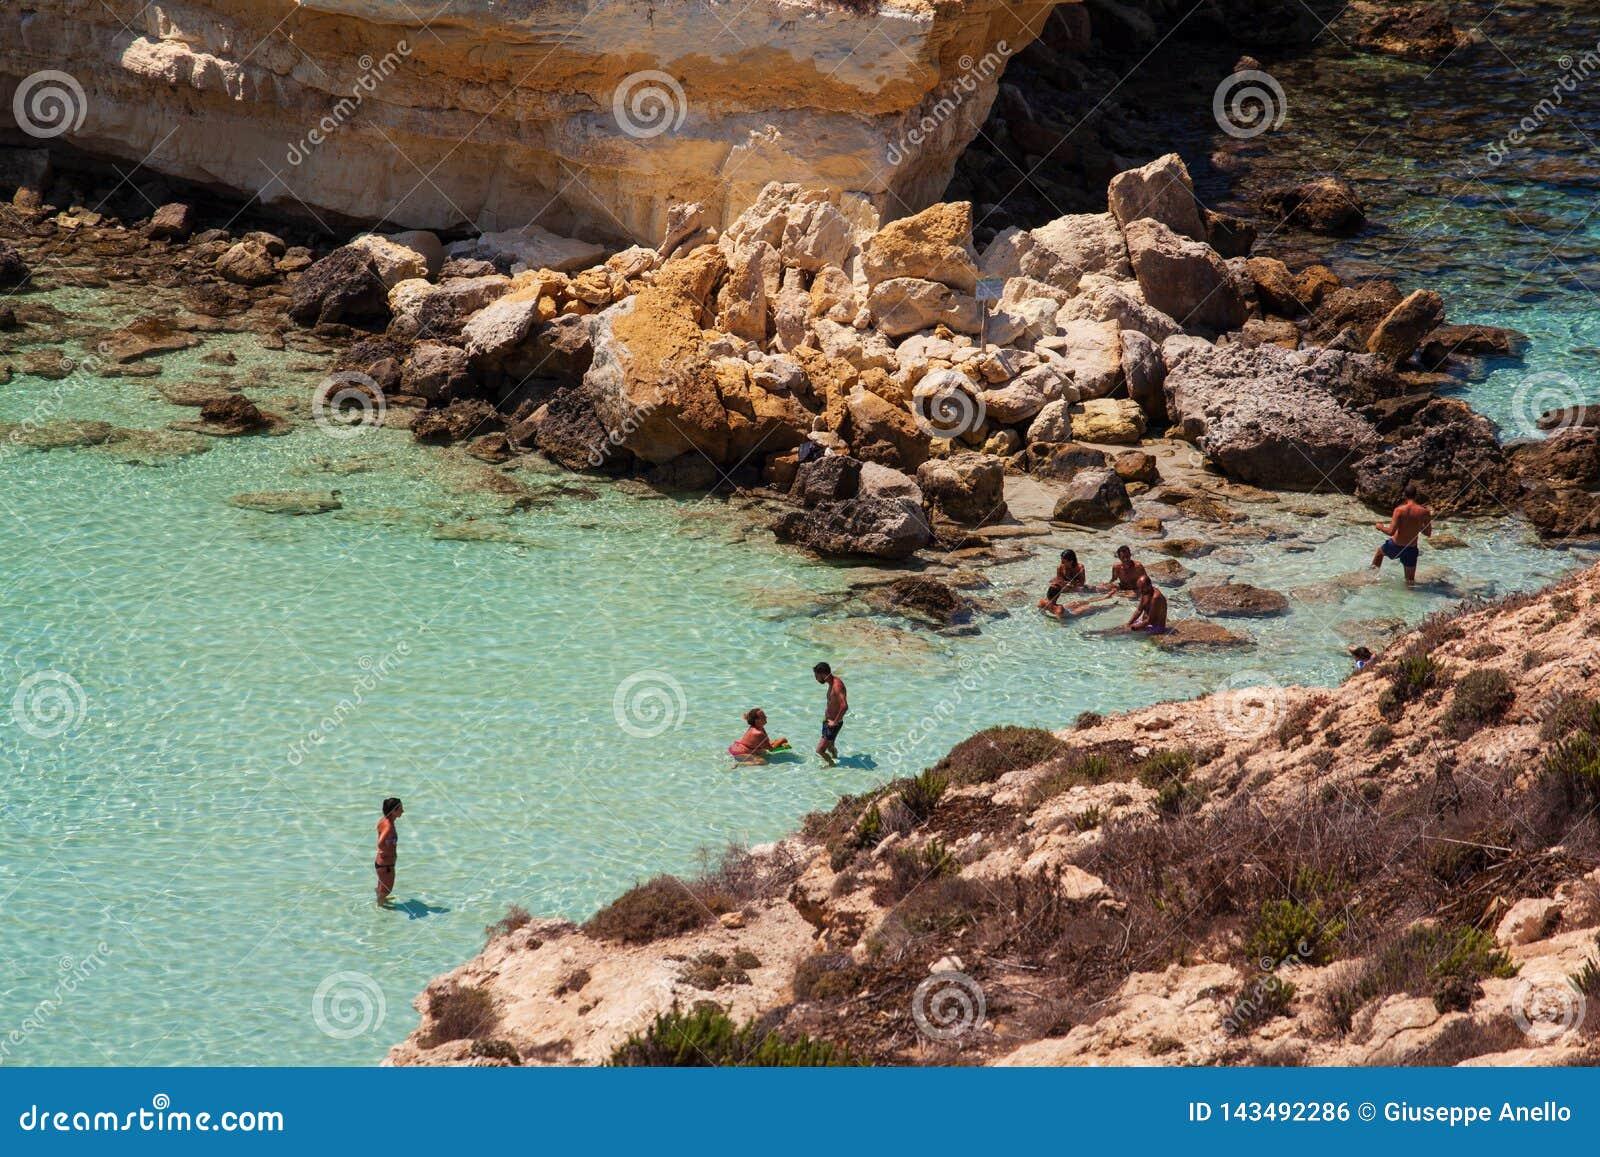 兰佩杜萨,Spiaggia dei conigli最著名的海地方的看法